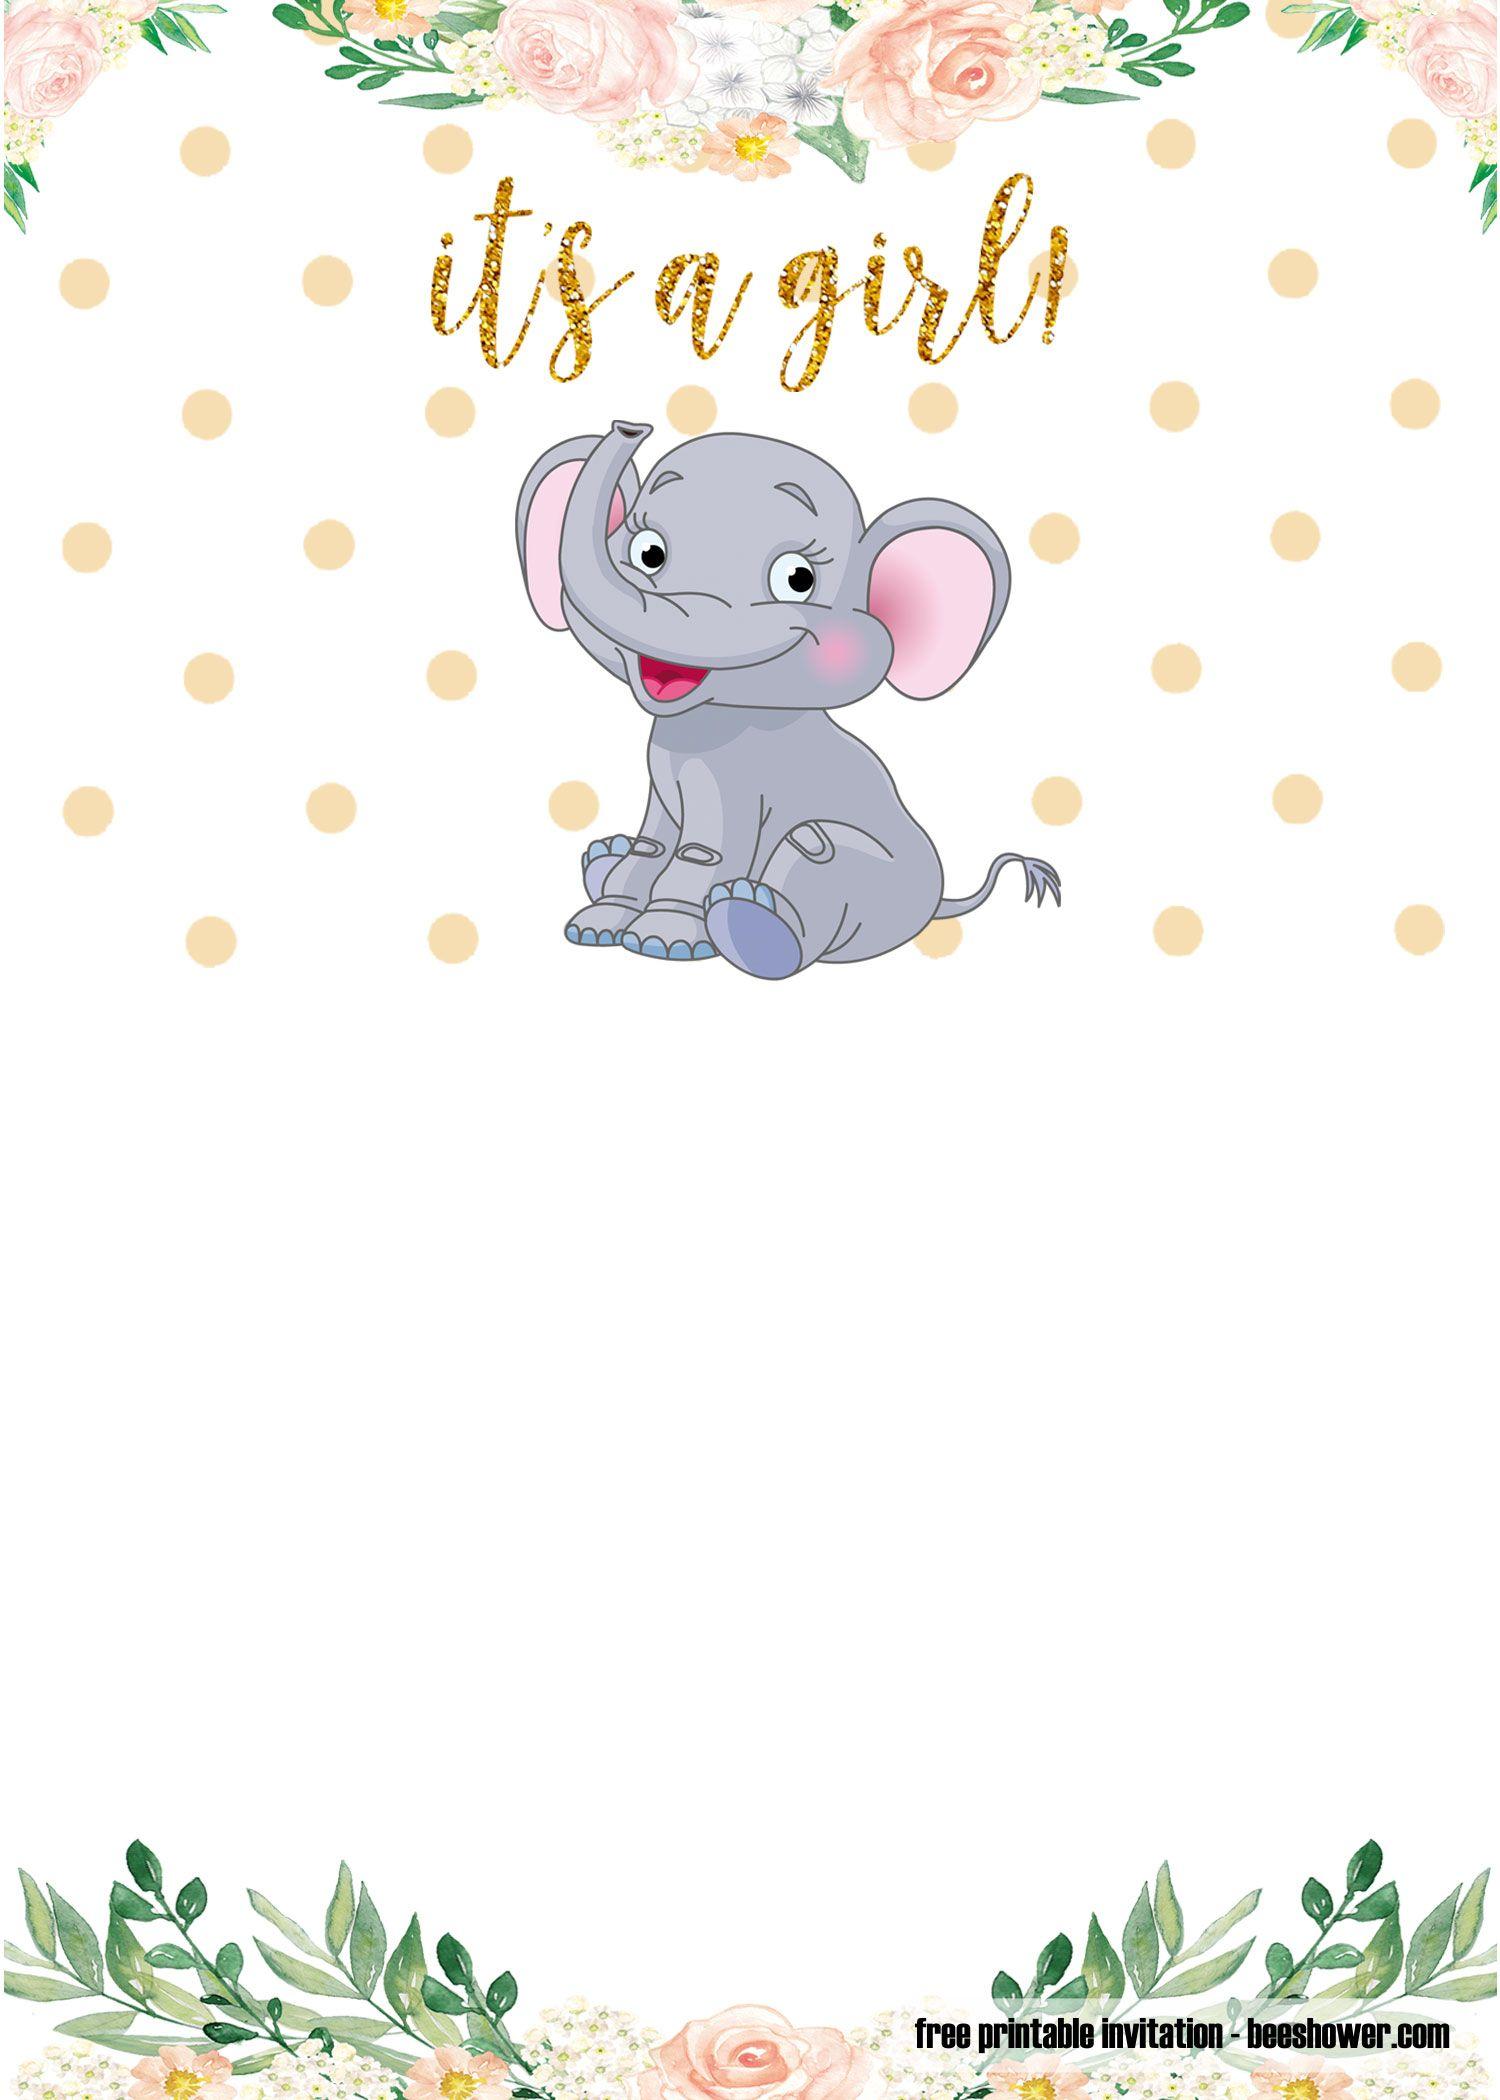 Free Printable Elephant Baby Shower Invitations Templates Baby Shower Invitations Templates Baby Shower Invitation Templates Baby Shower Invitations